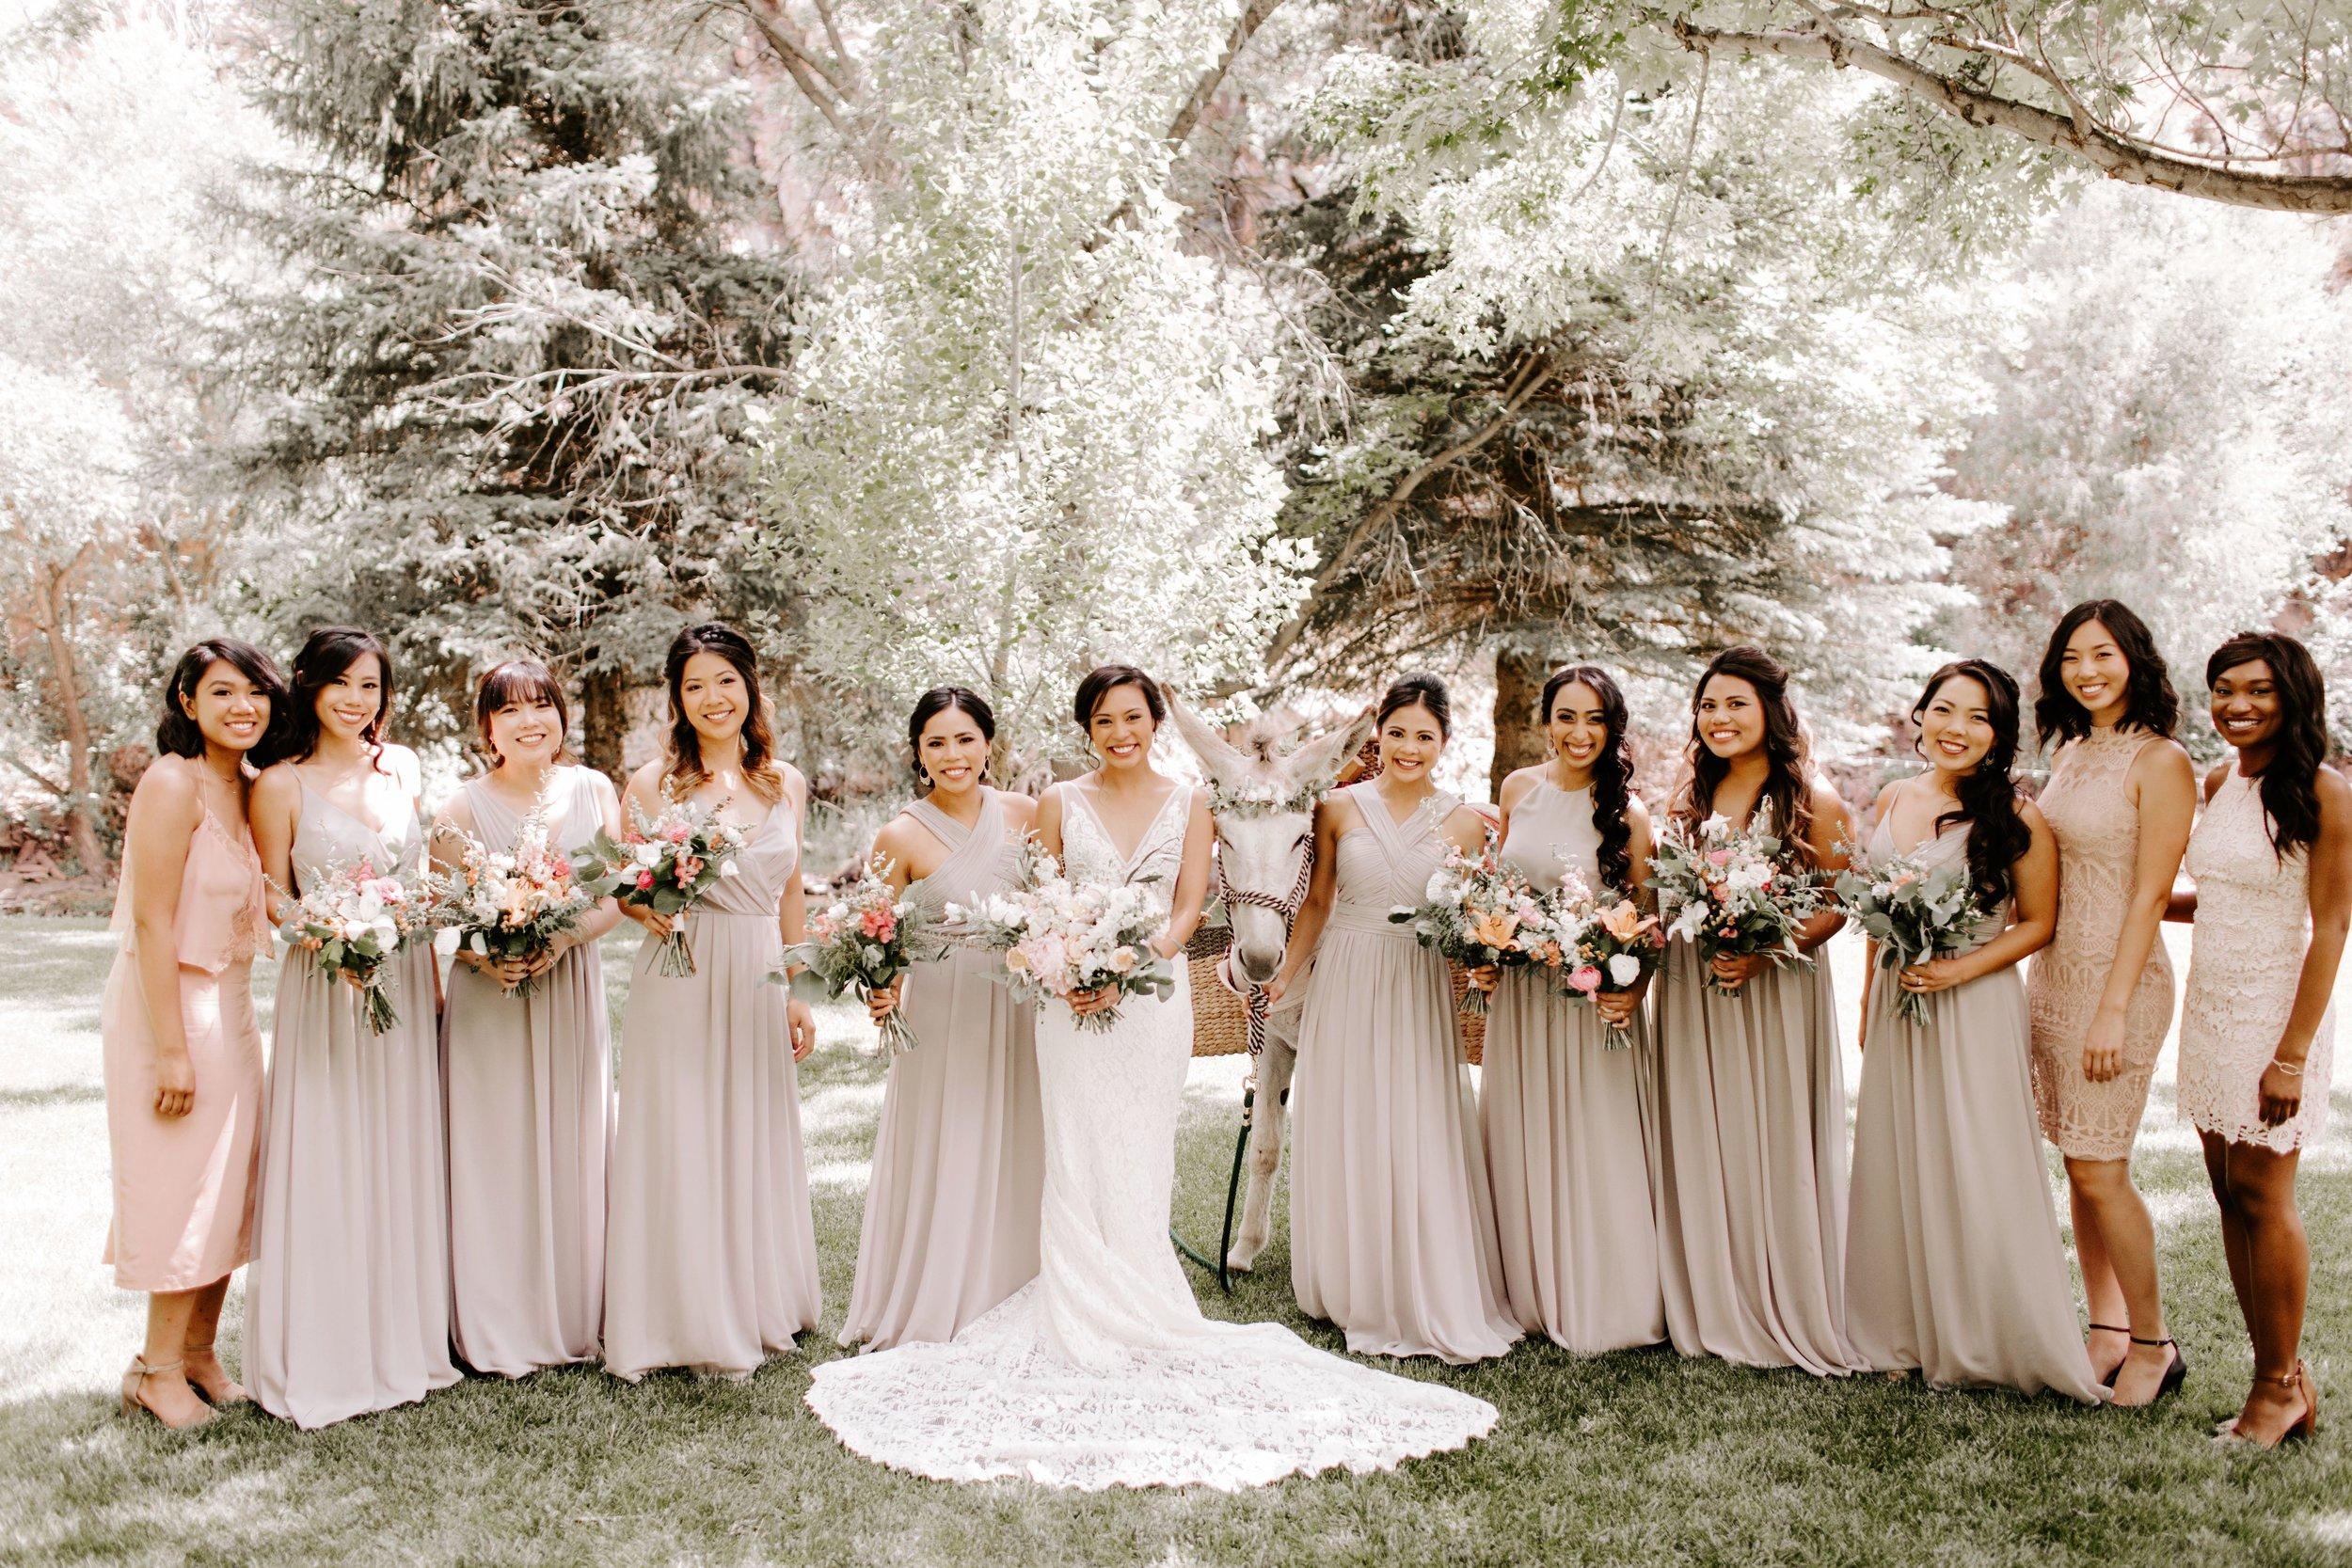 Spencer + Krysia Wedding237.jpg